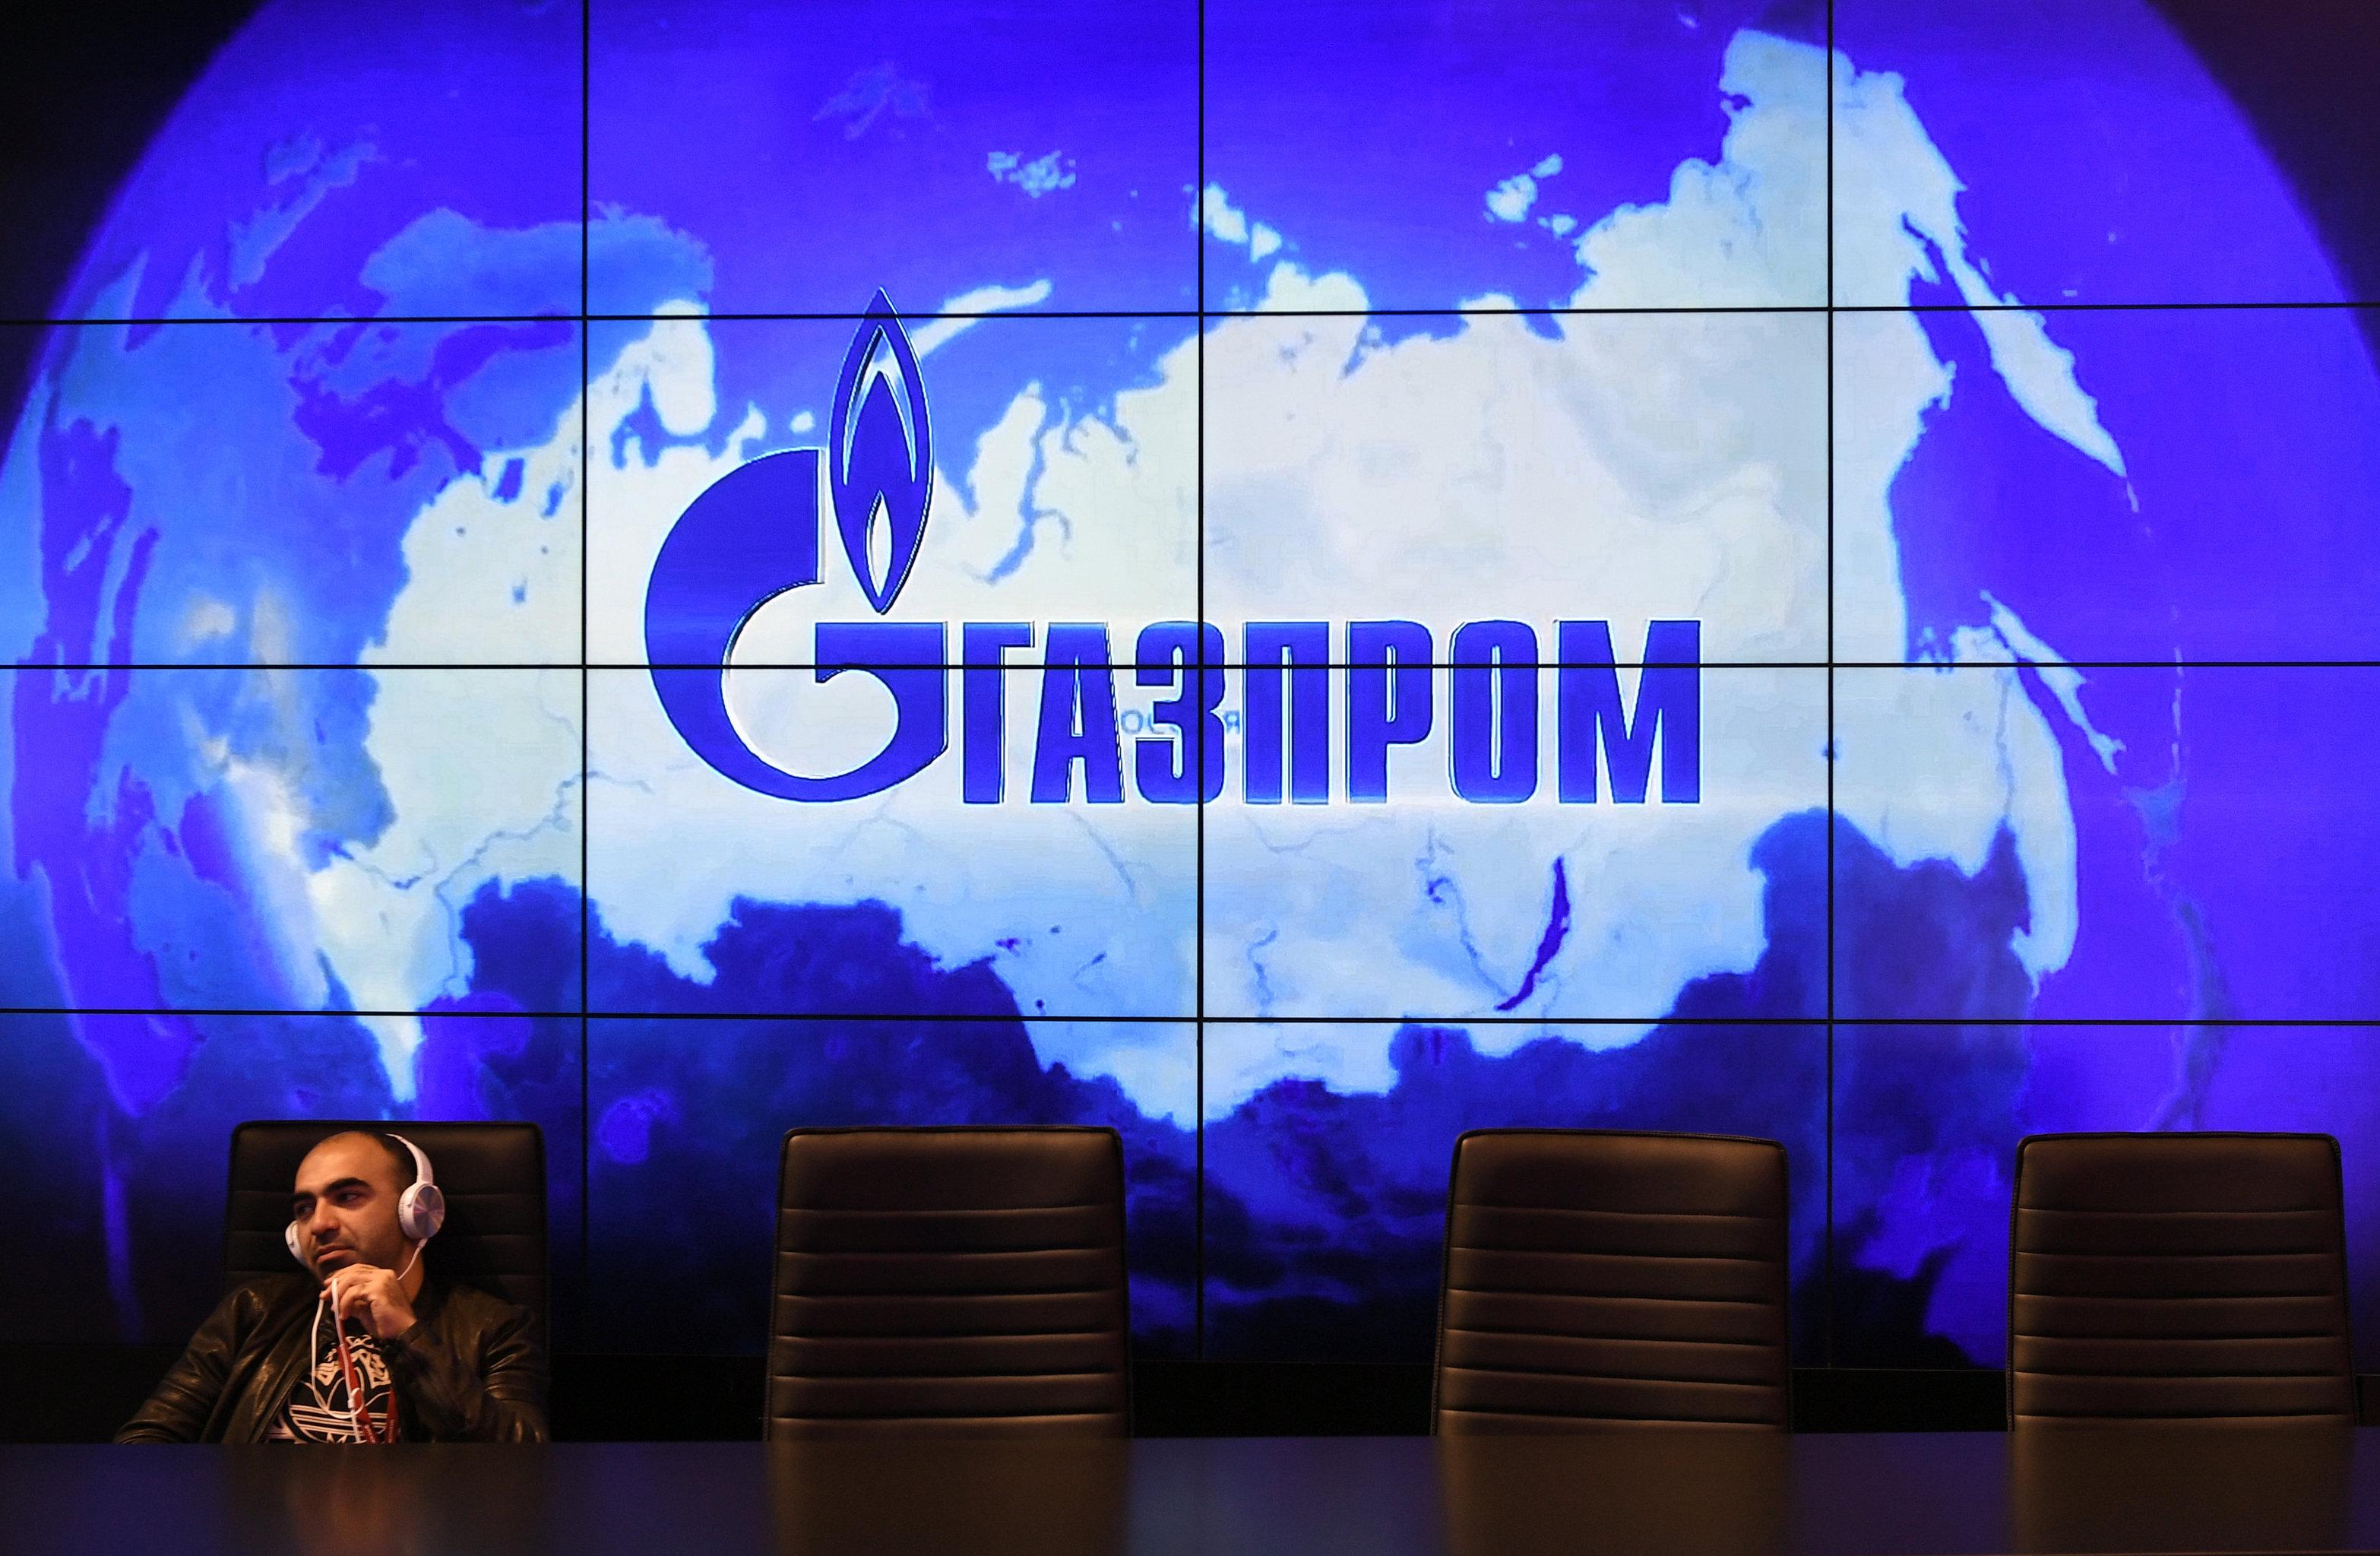 ExpoForum in the run-up to the 2017 St. Petersburg International Economic Forum